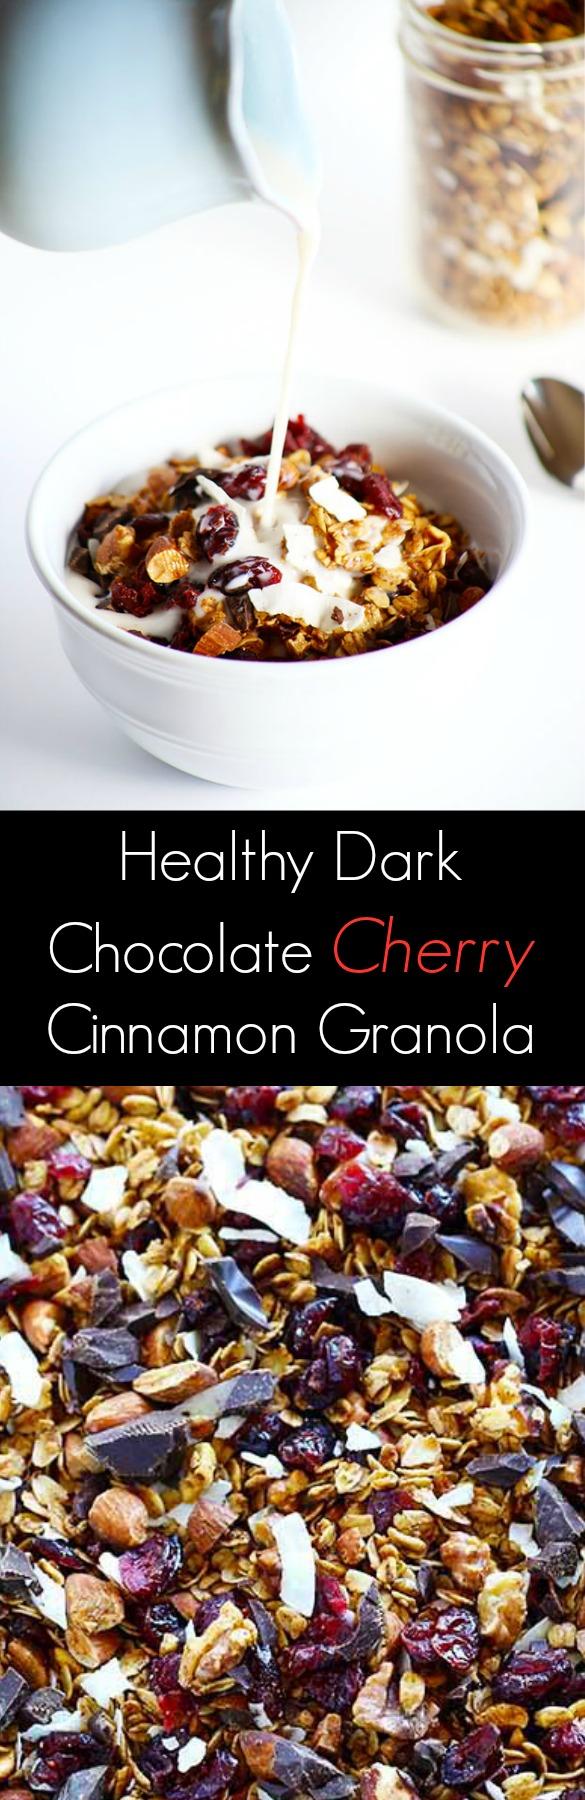 Healthy Dark Chocolate Cherry Cinnamon Granola - TwoRaspberries